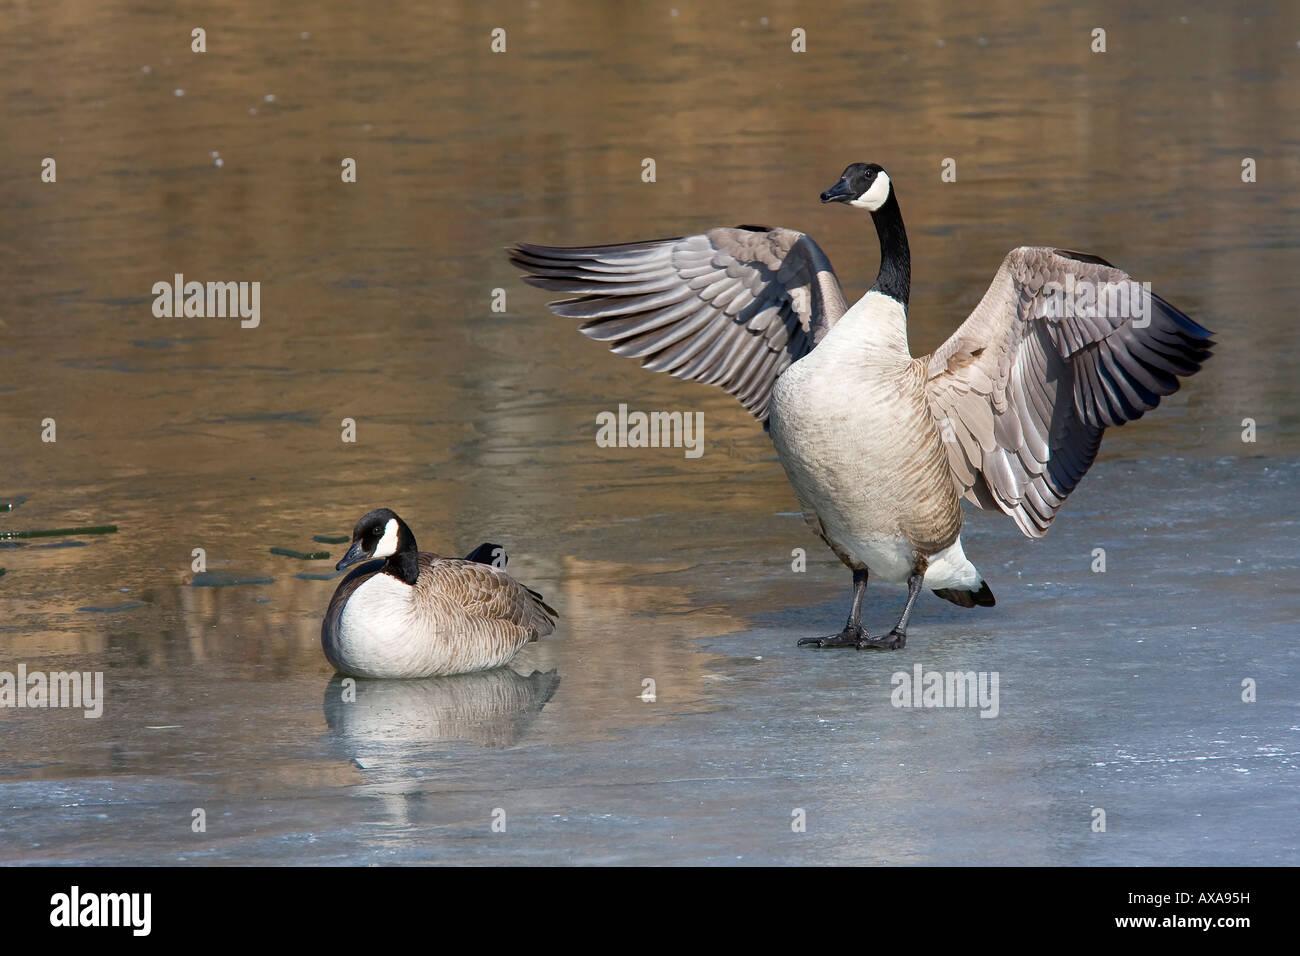 Pair of geese at the Inglewood bird sanctuary, Calgary Alberta. Stock Photo